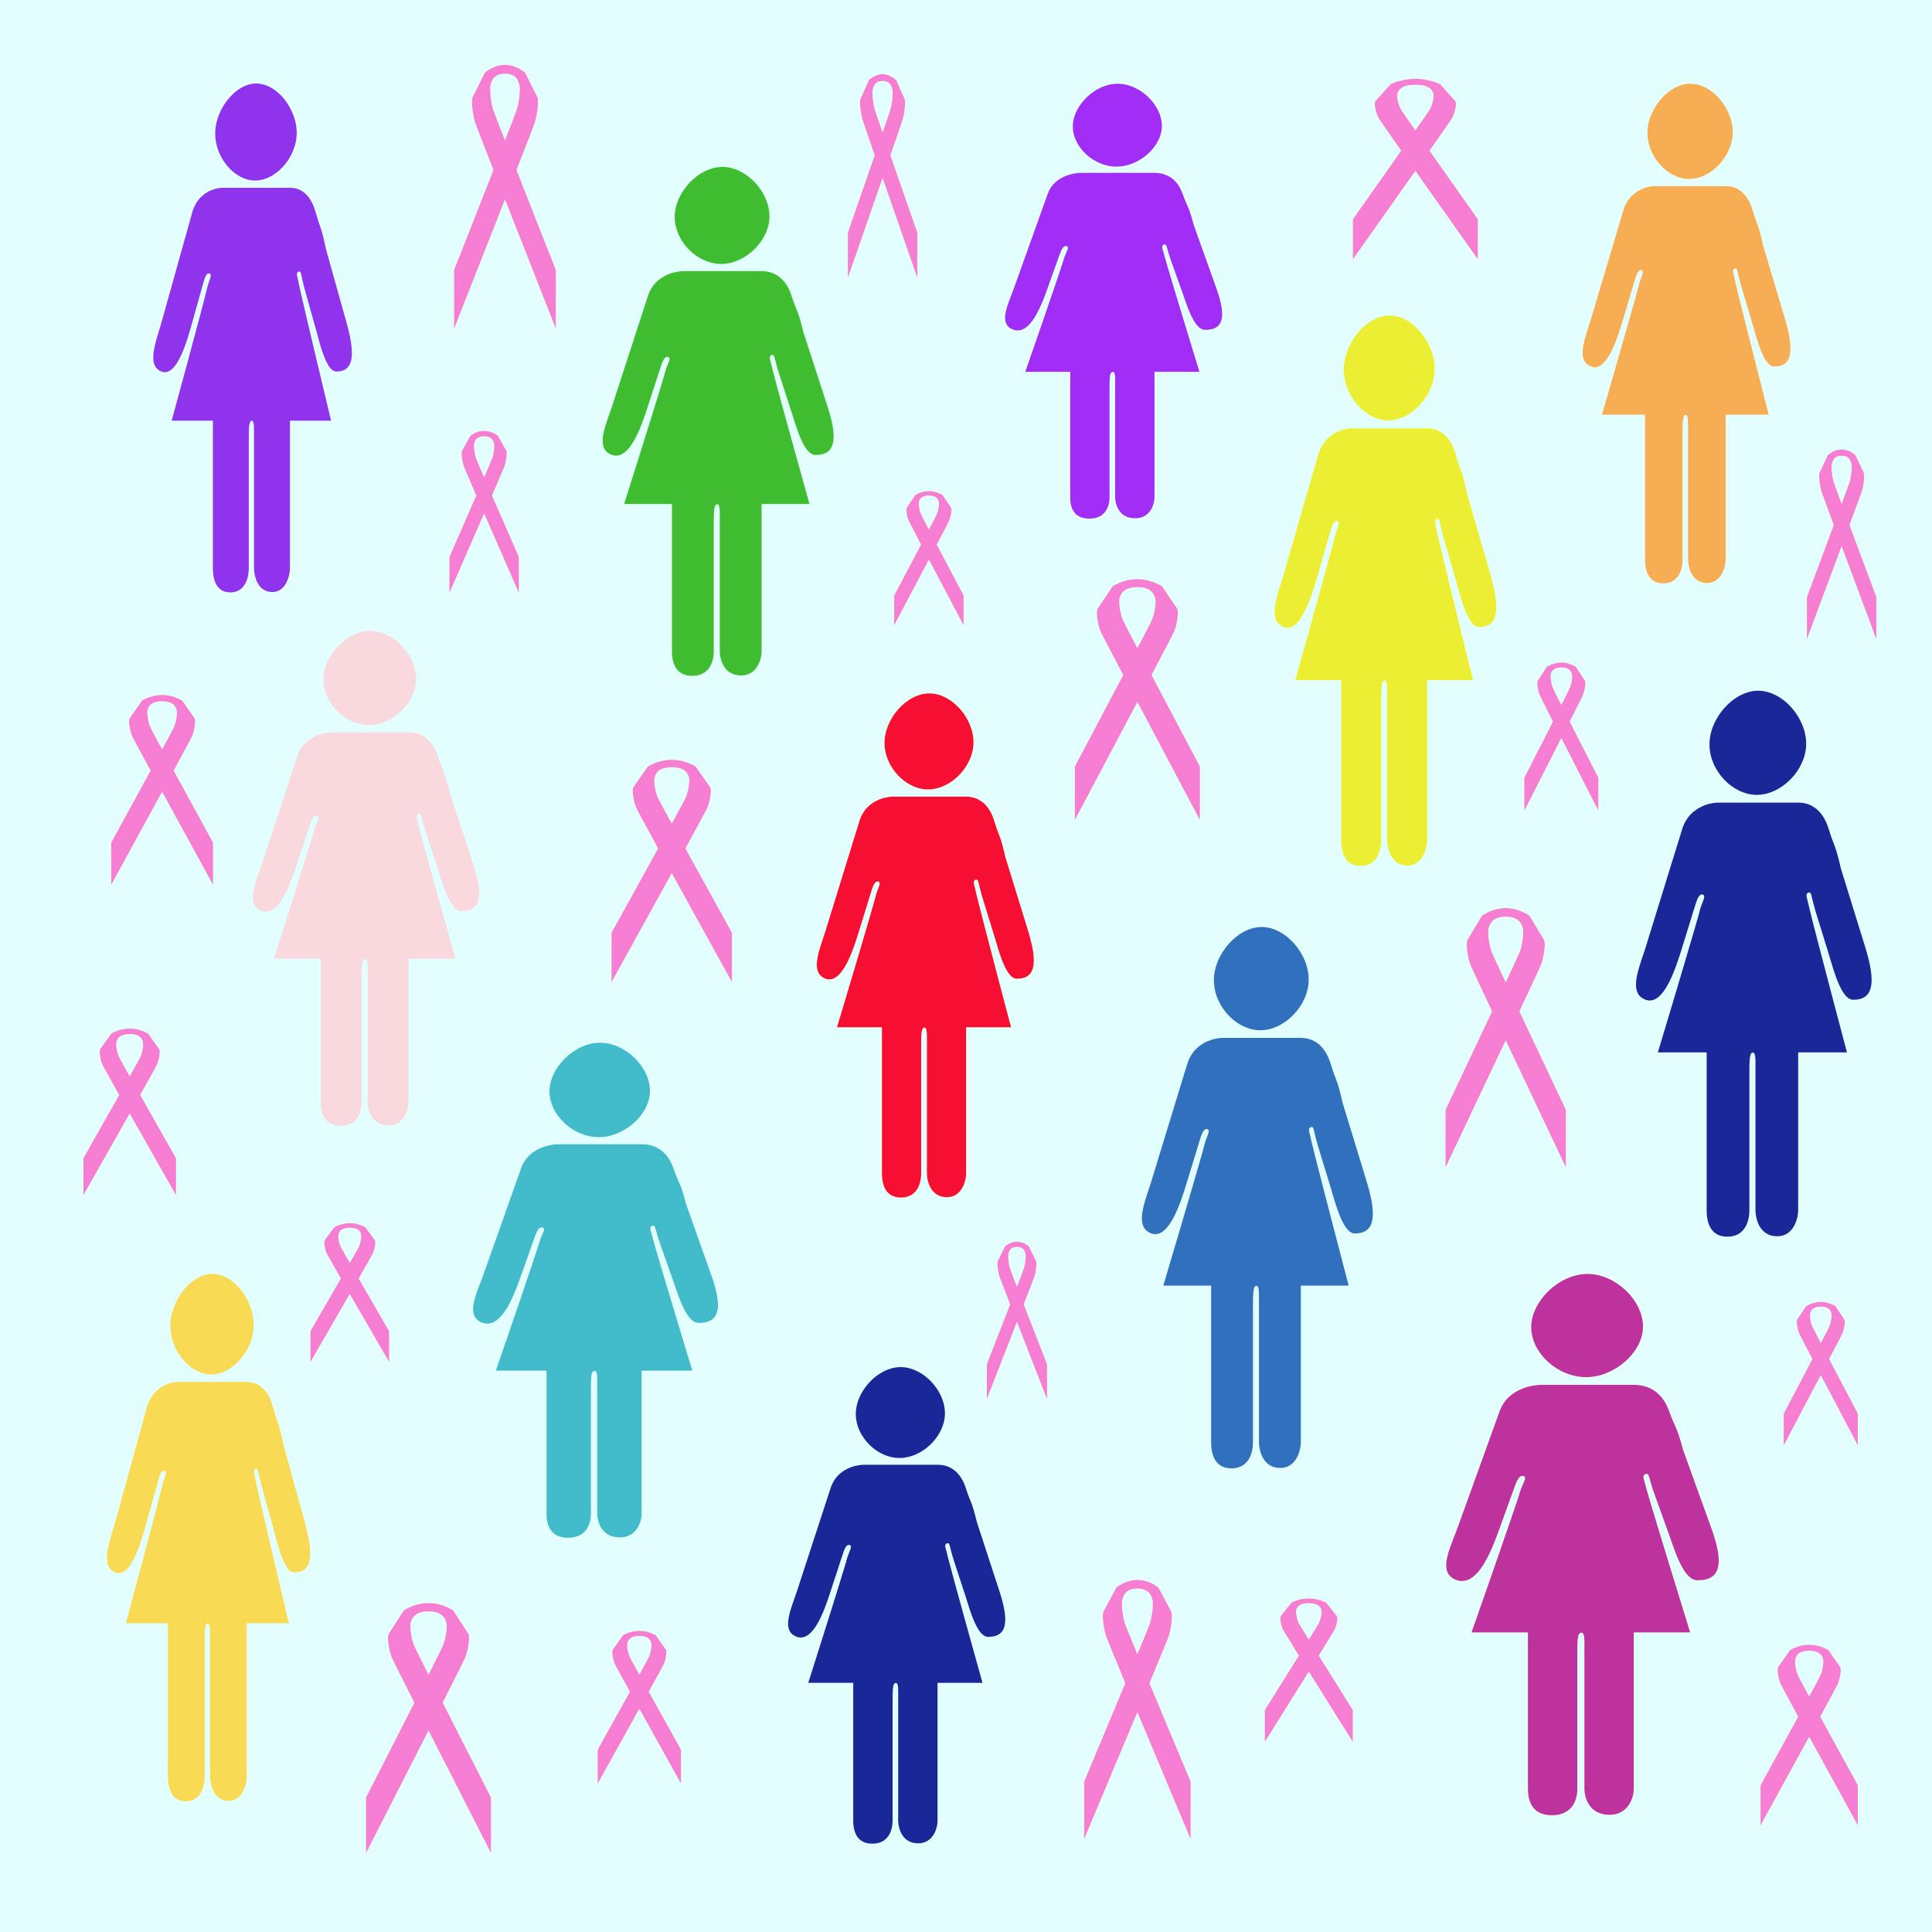 Nemám rakovinu prsu?